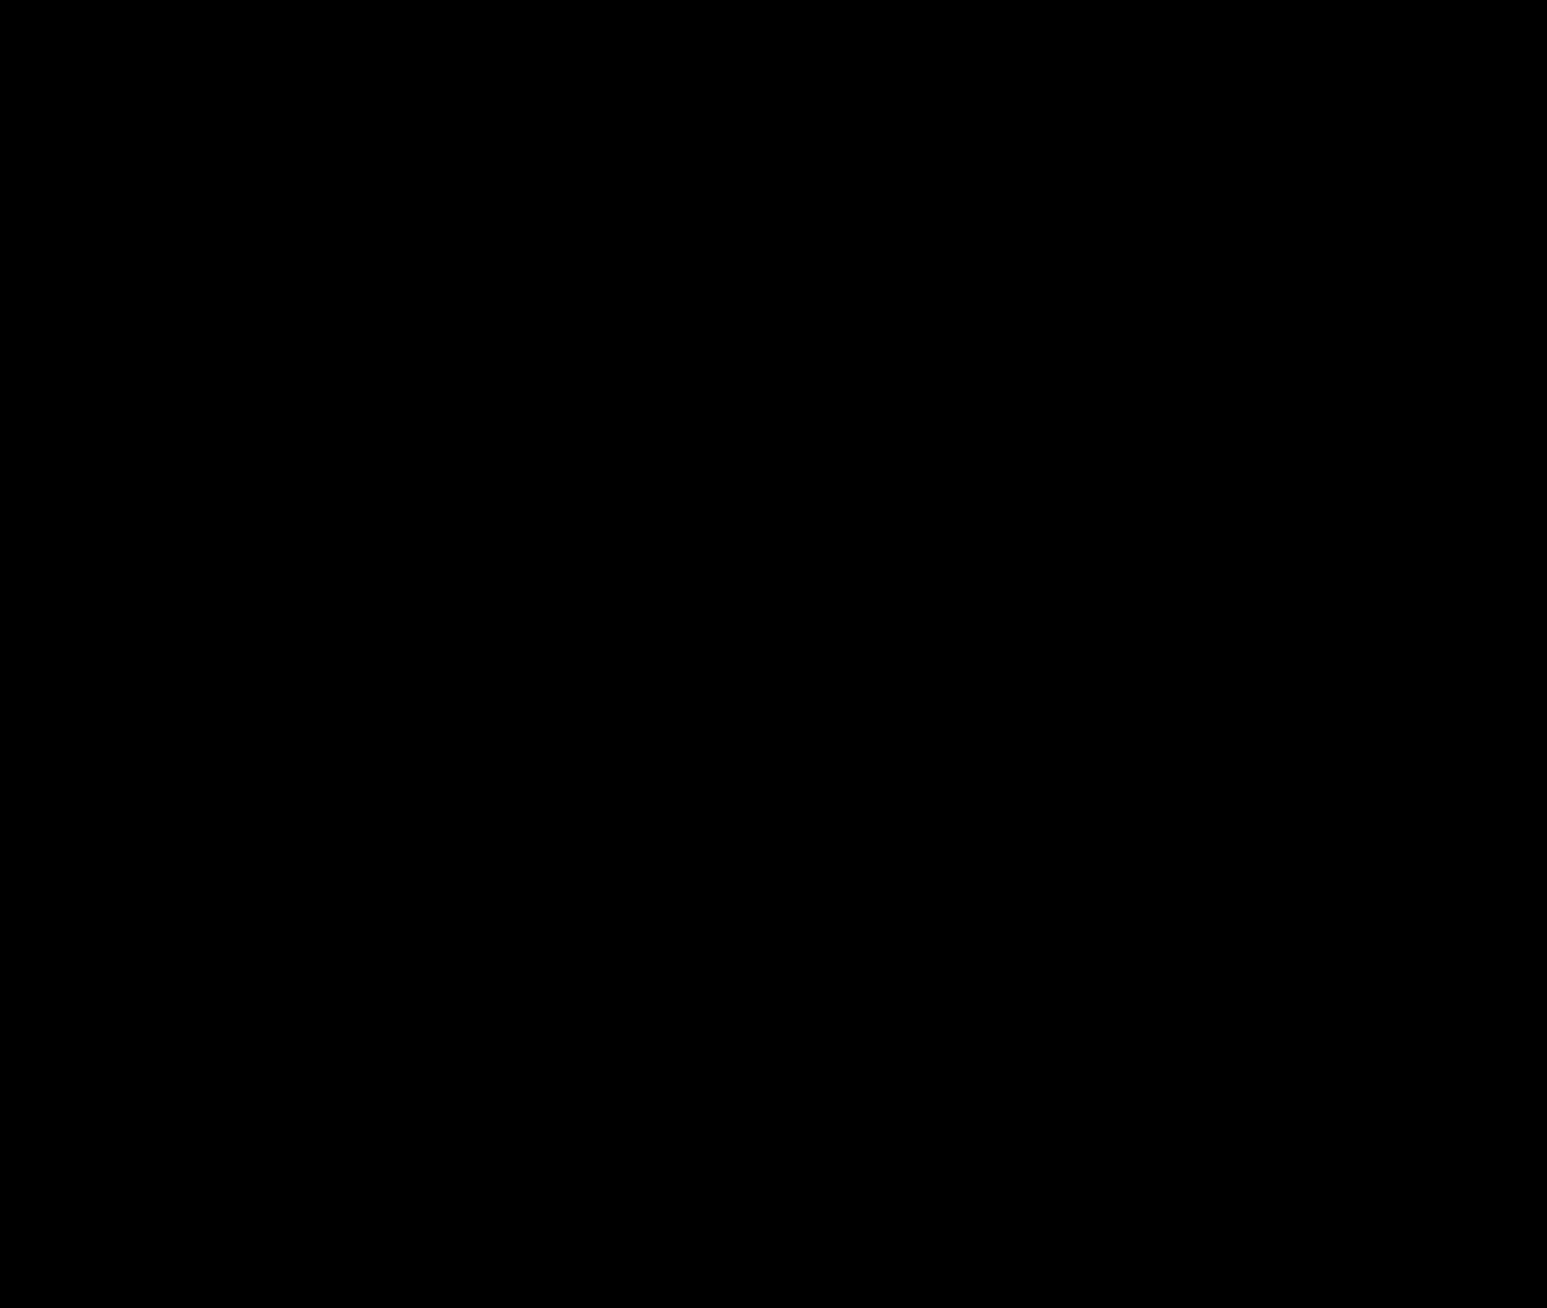 Free ukiyo-e illustration of A man running and chasing